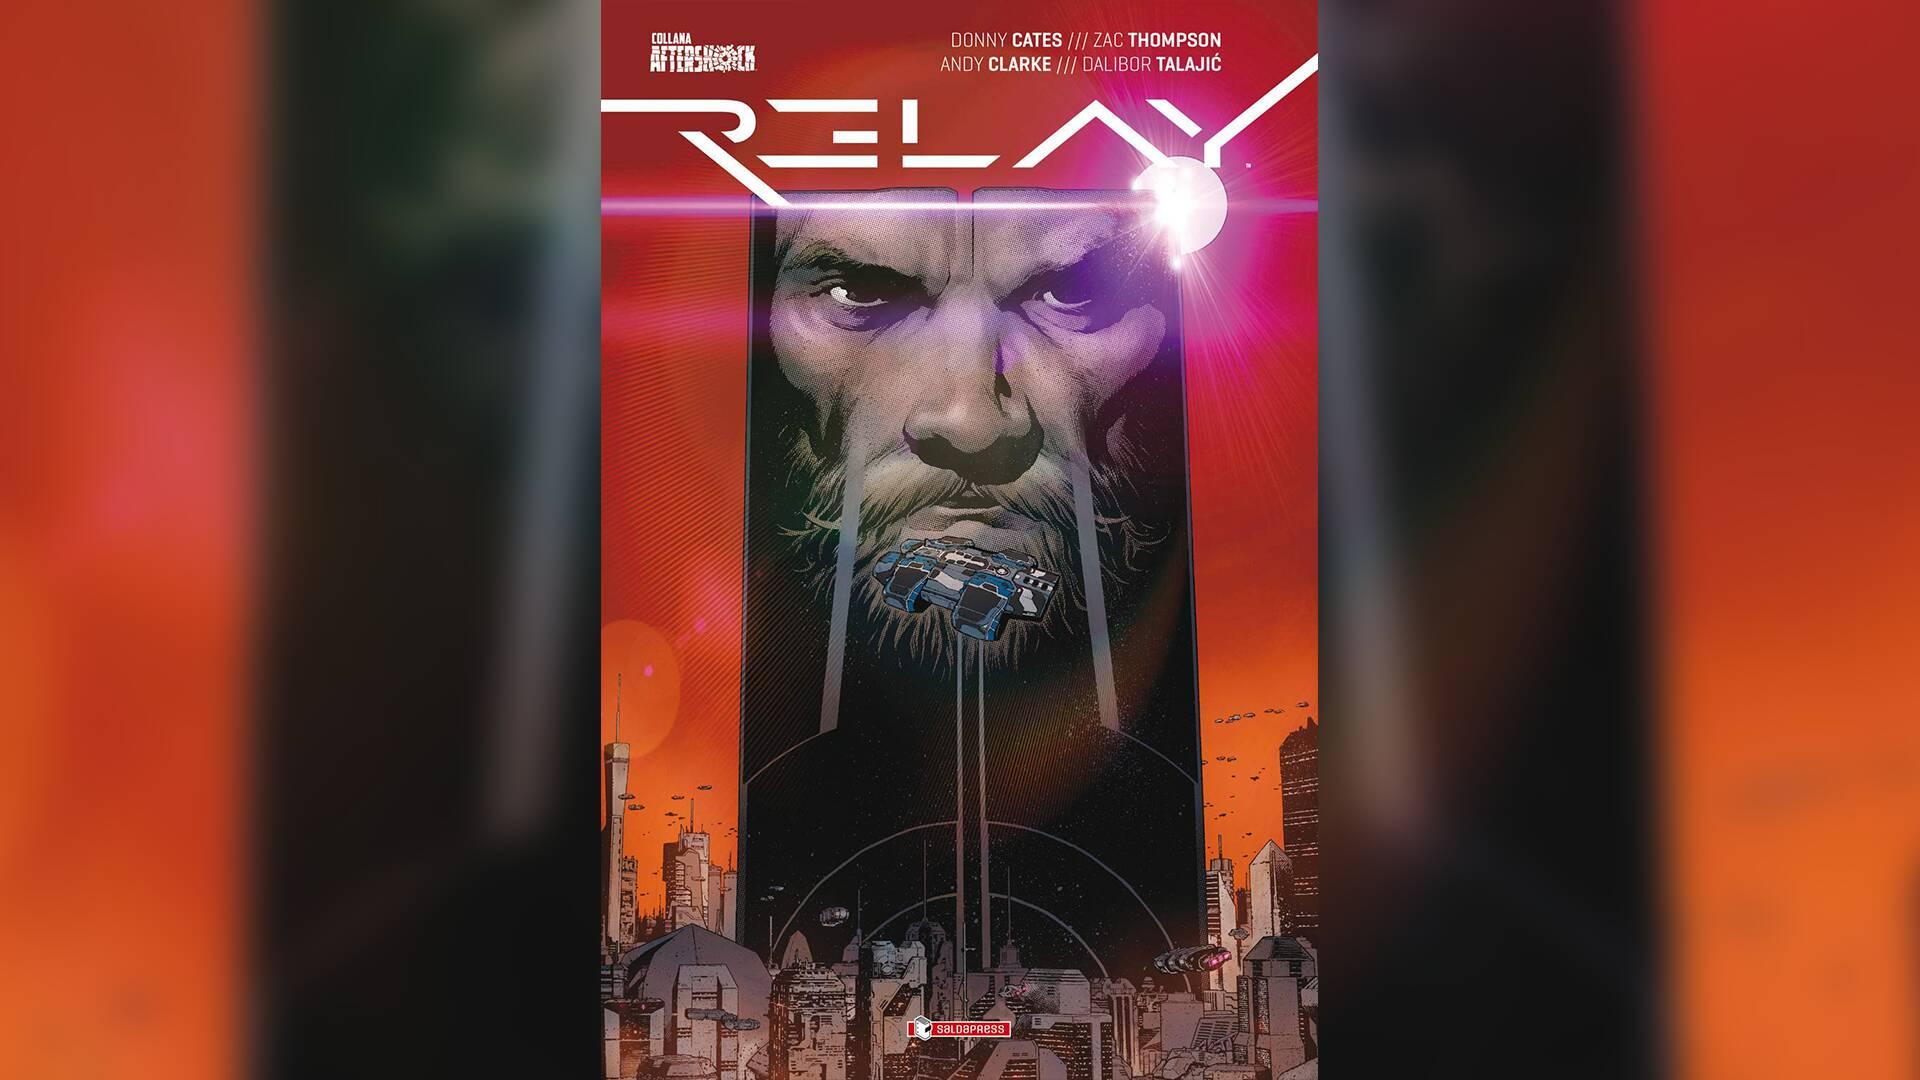 Relay - Realtà Negata